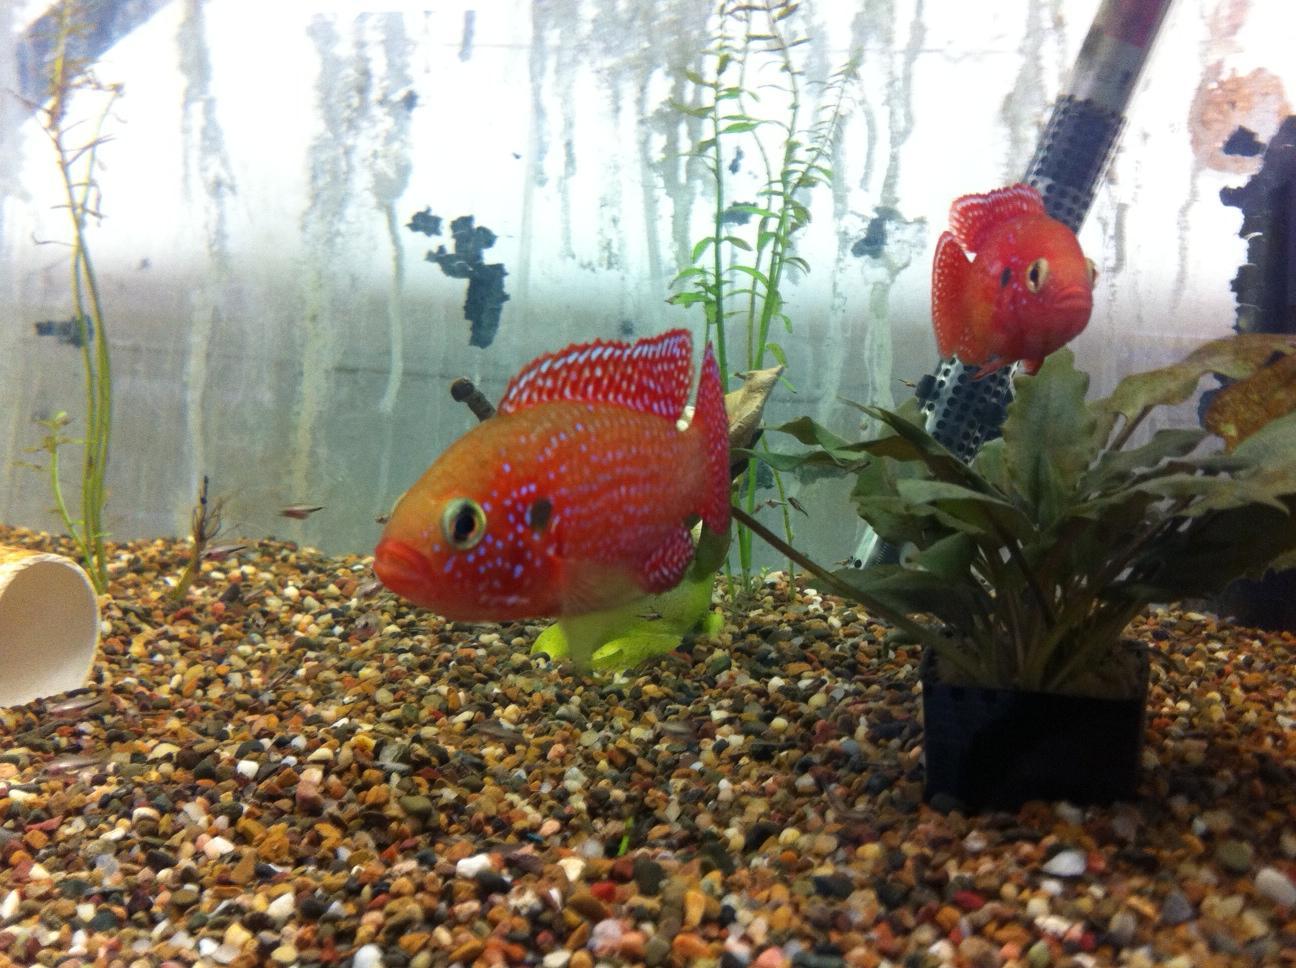 Freshwater jewel fish - Advertisements